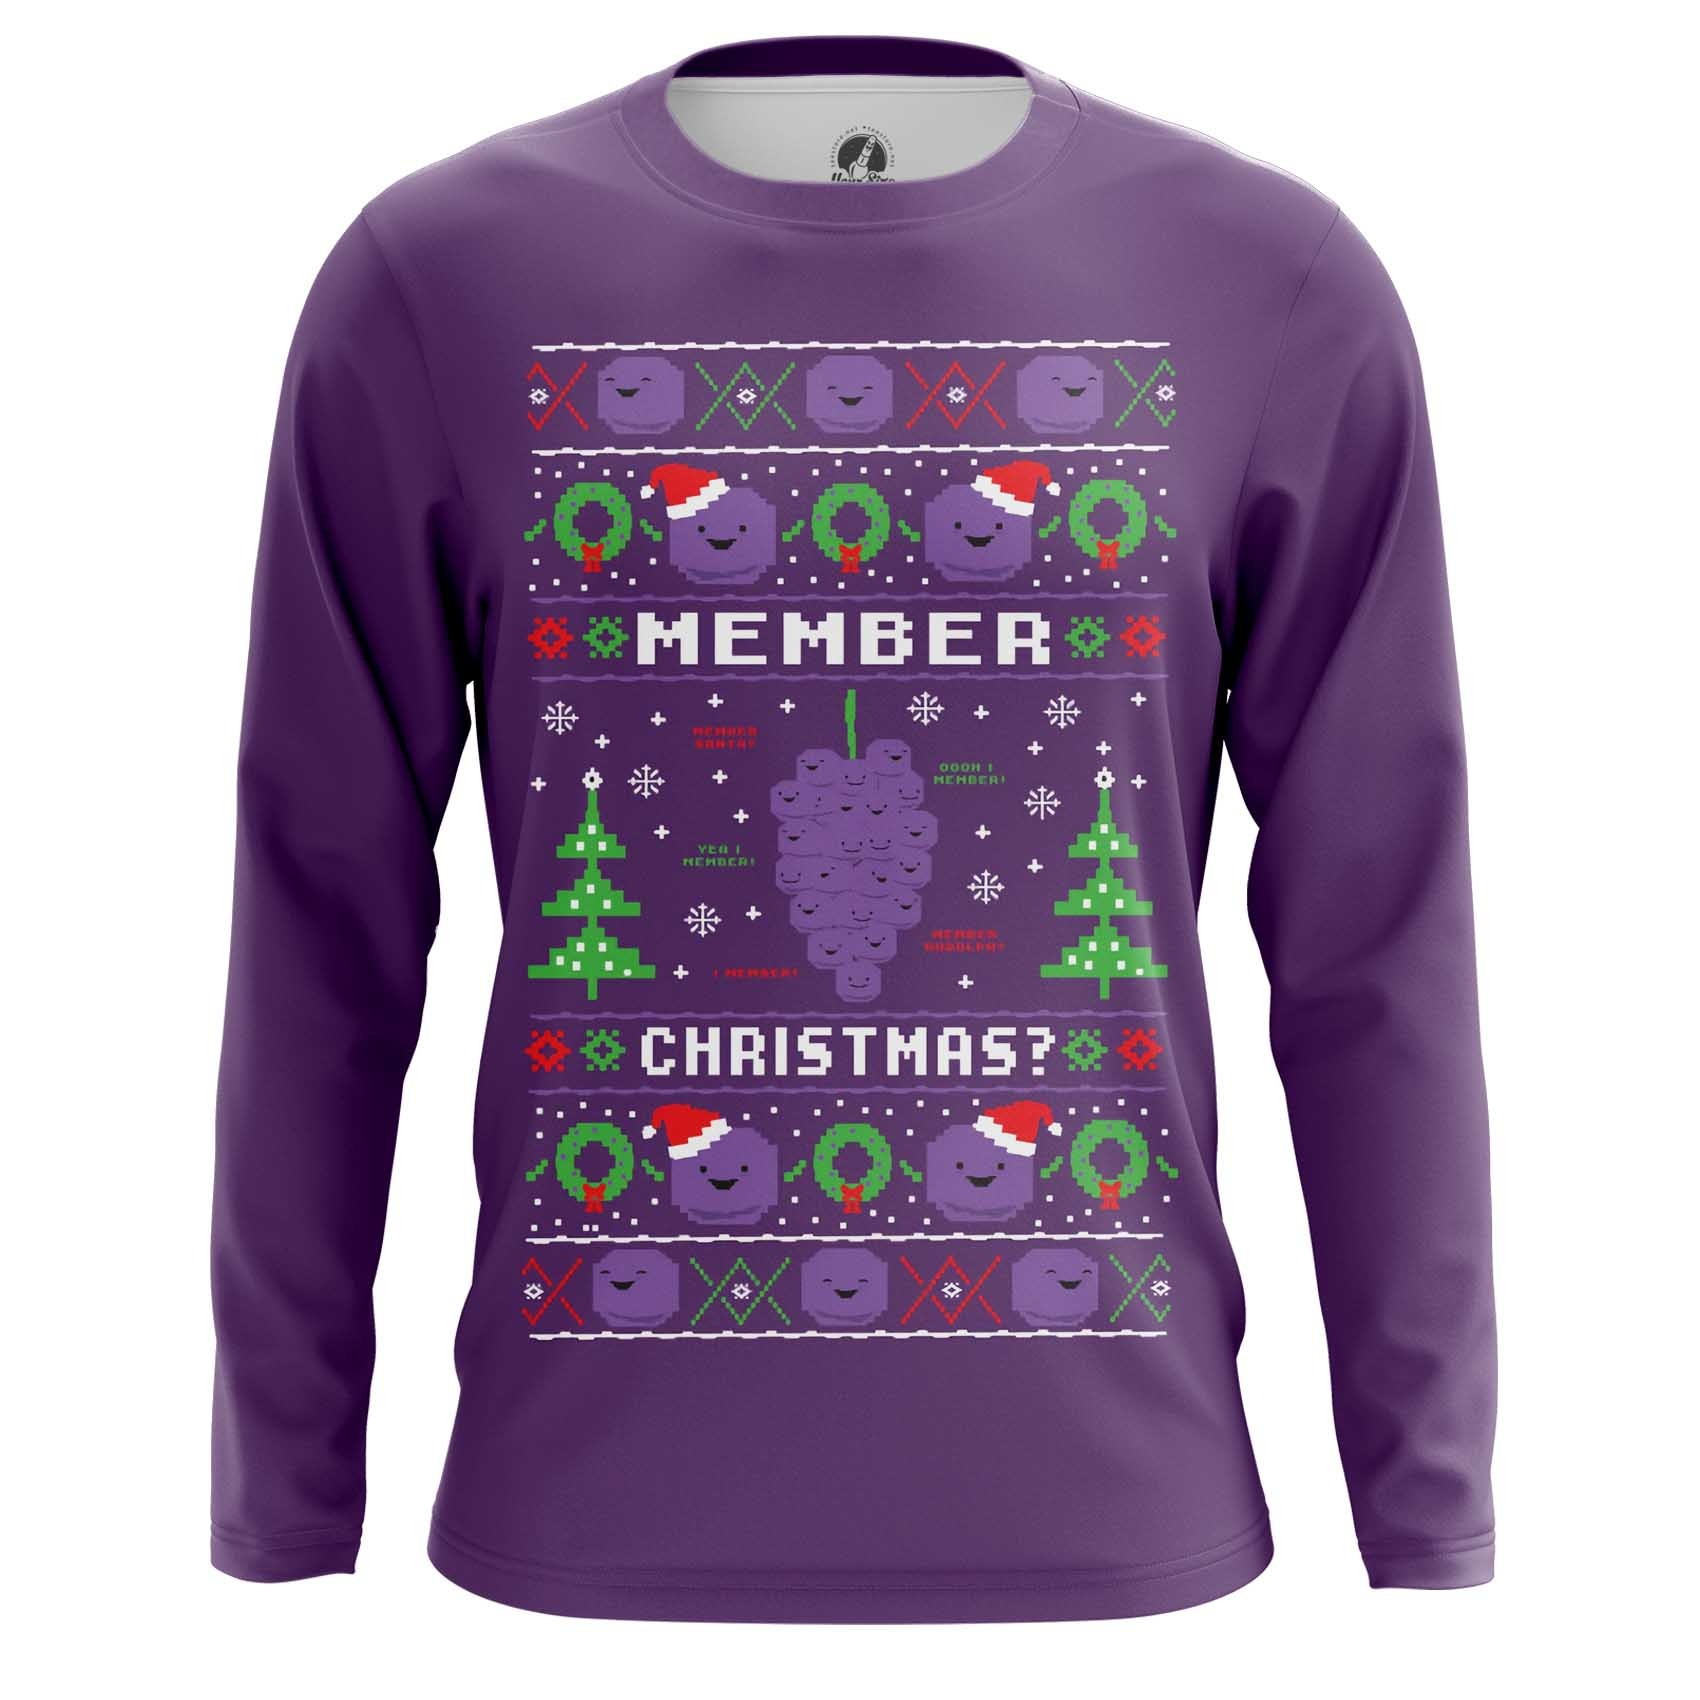 Collectibles T-Shirt Member Christmas Christmas